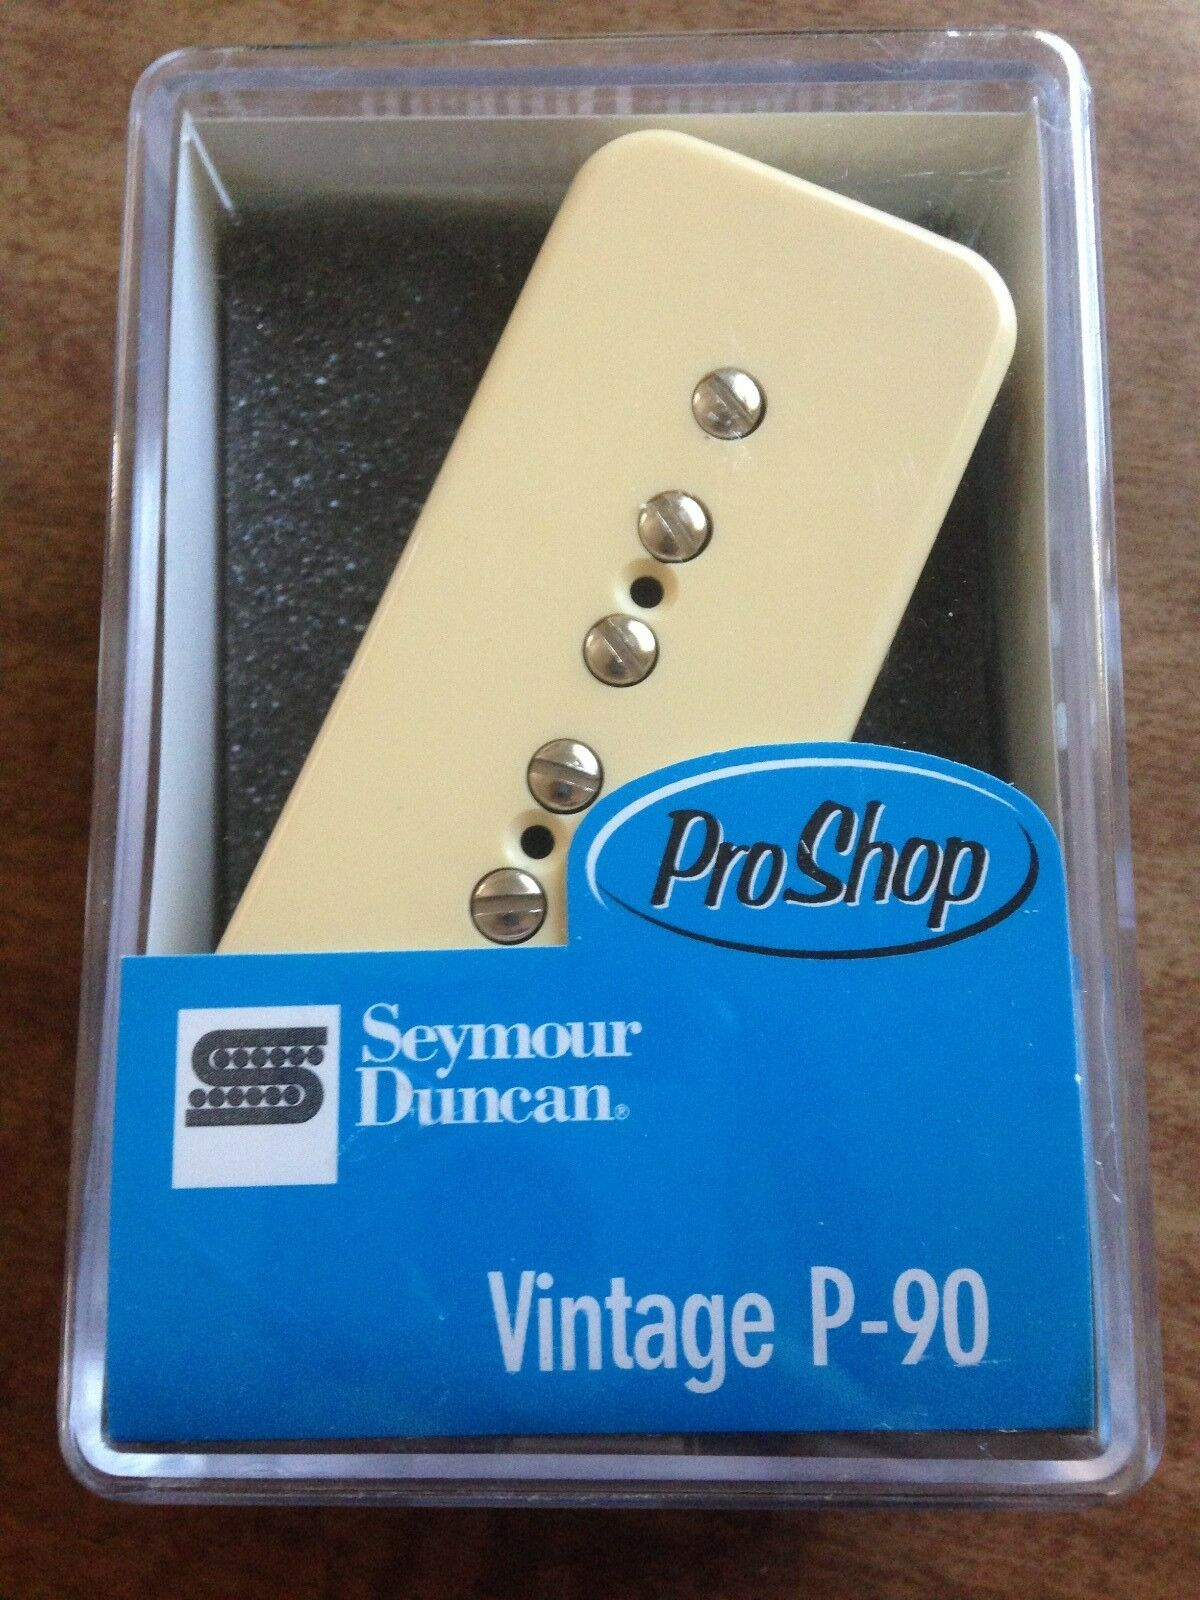 Seymour Duncan Vintage P-90 Soapbar Neck Pickup Creme Cover SP90-1n 11301-05-Crc